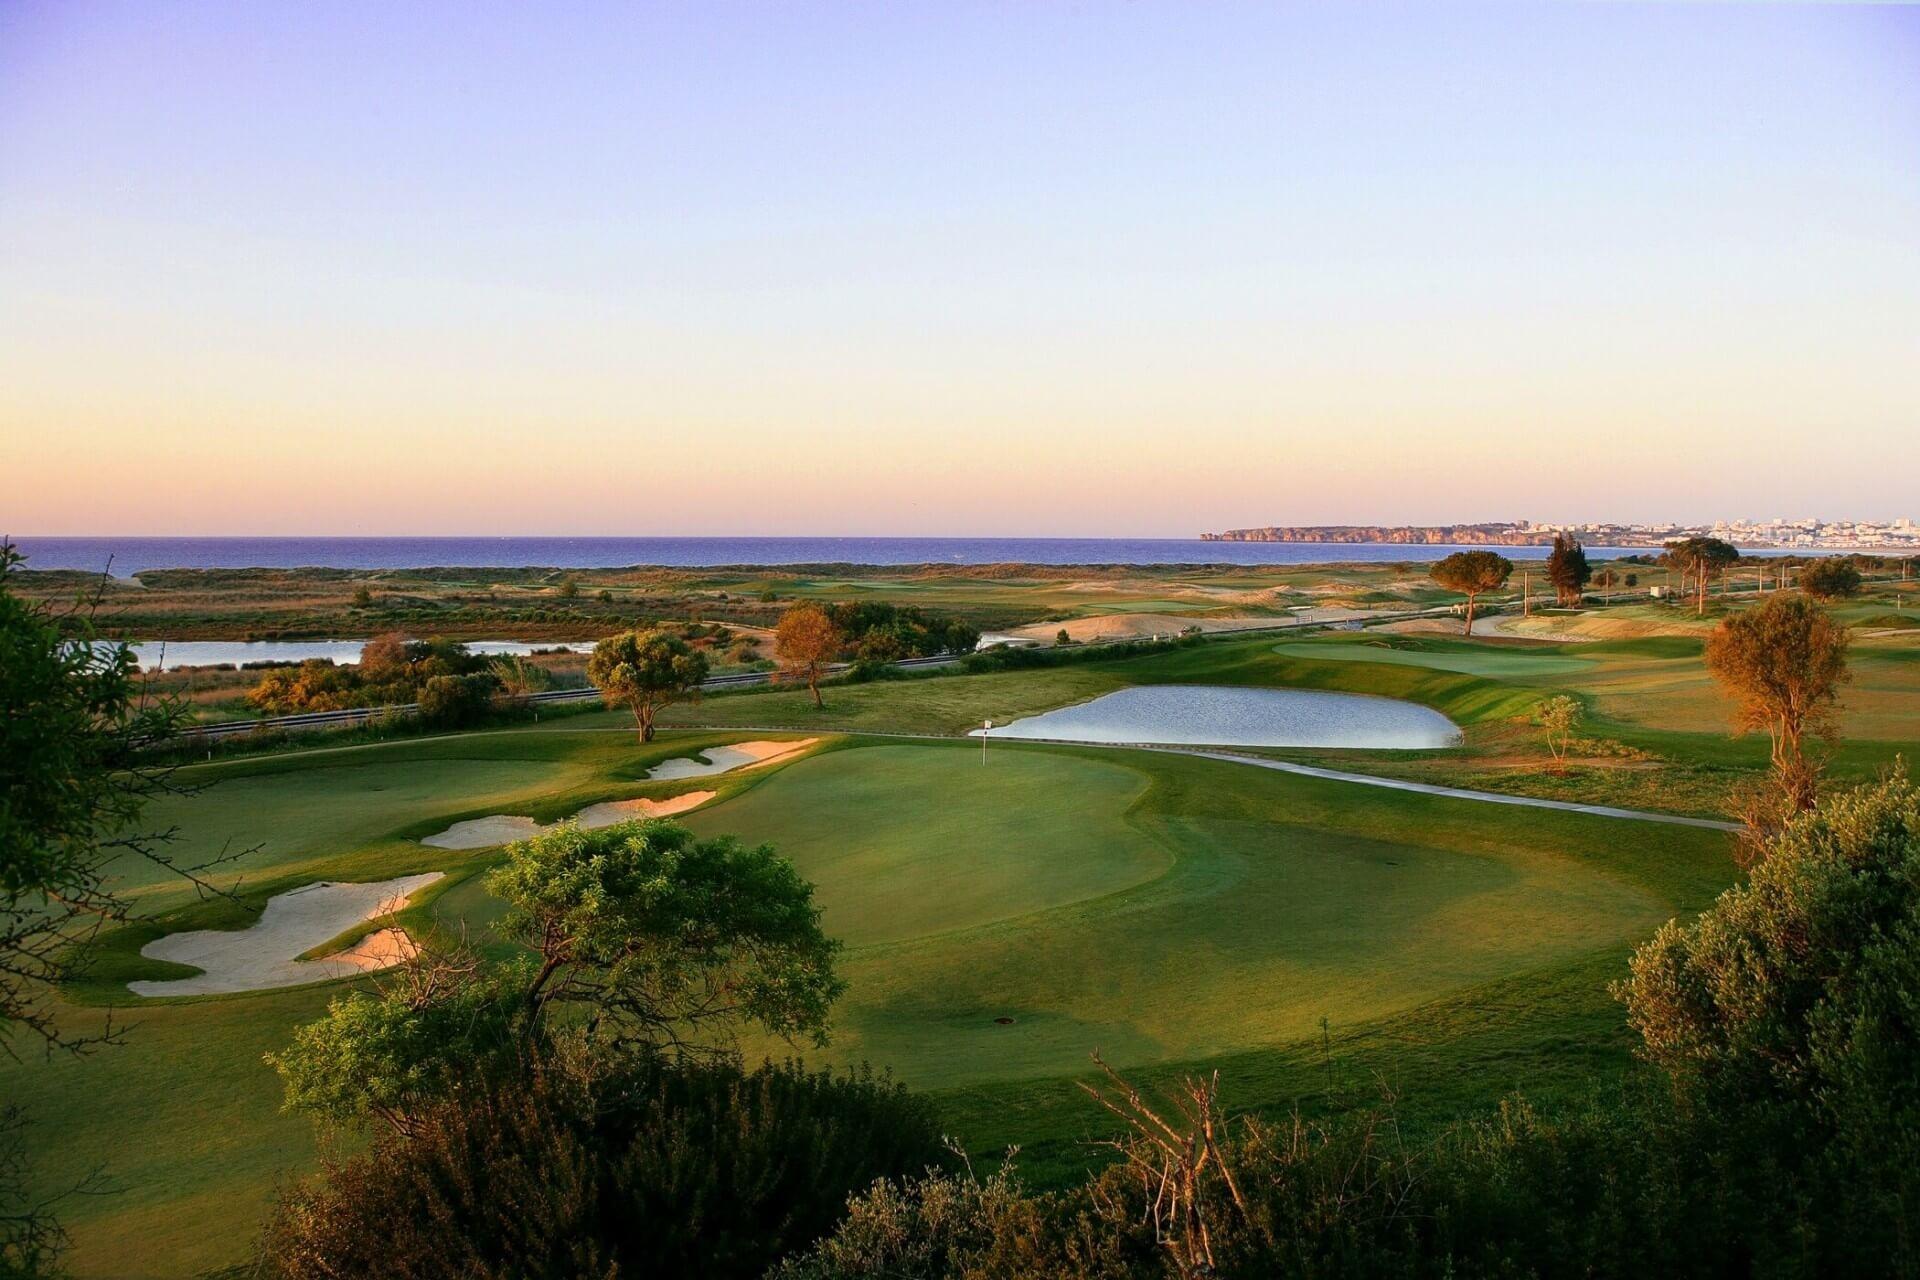 Portuguese golf clubs portuguese golf clubs Portuguese golf clubs: The perfect place for you to relax Portuguese golf clubs 2